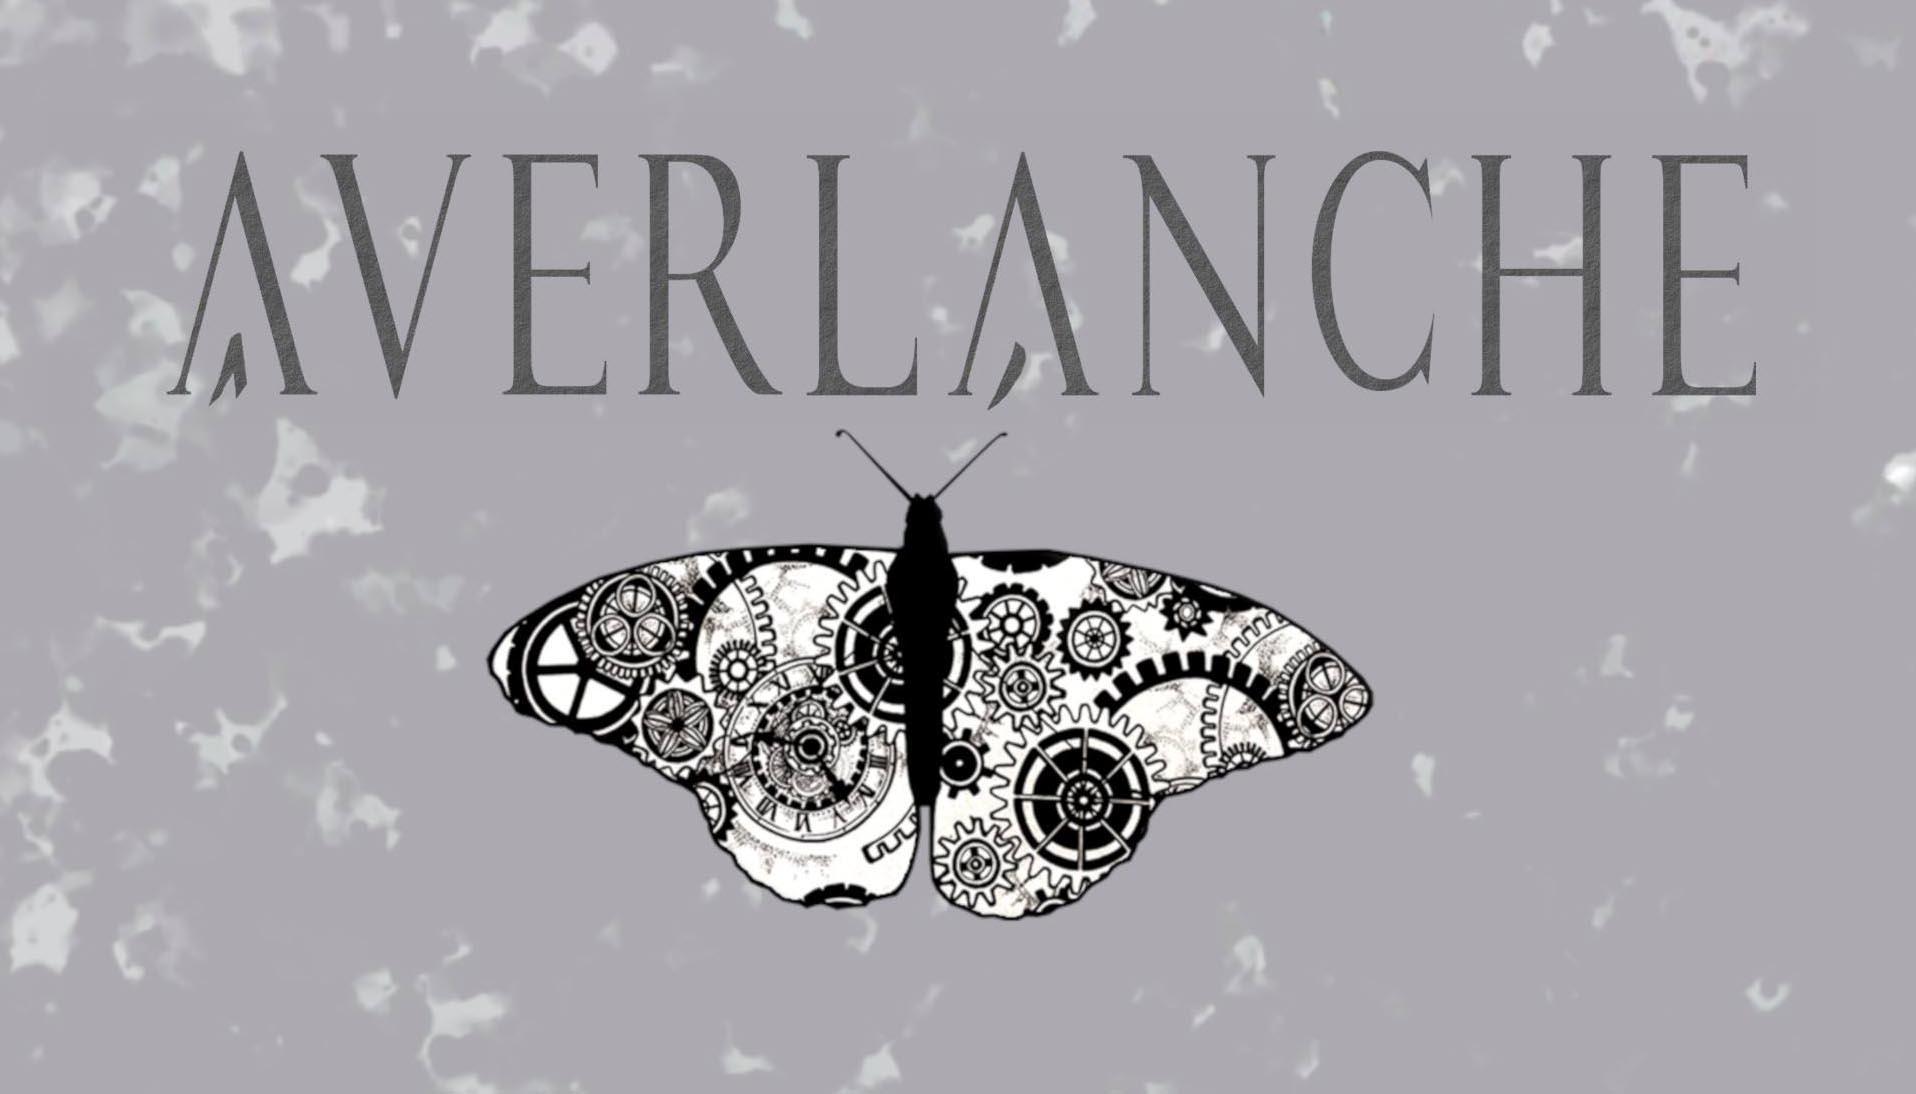 Averlanche Logo